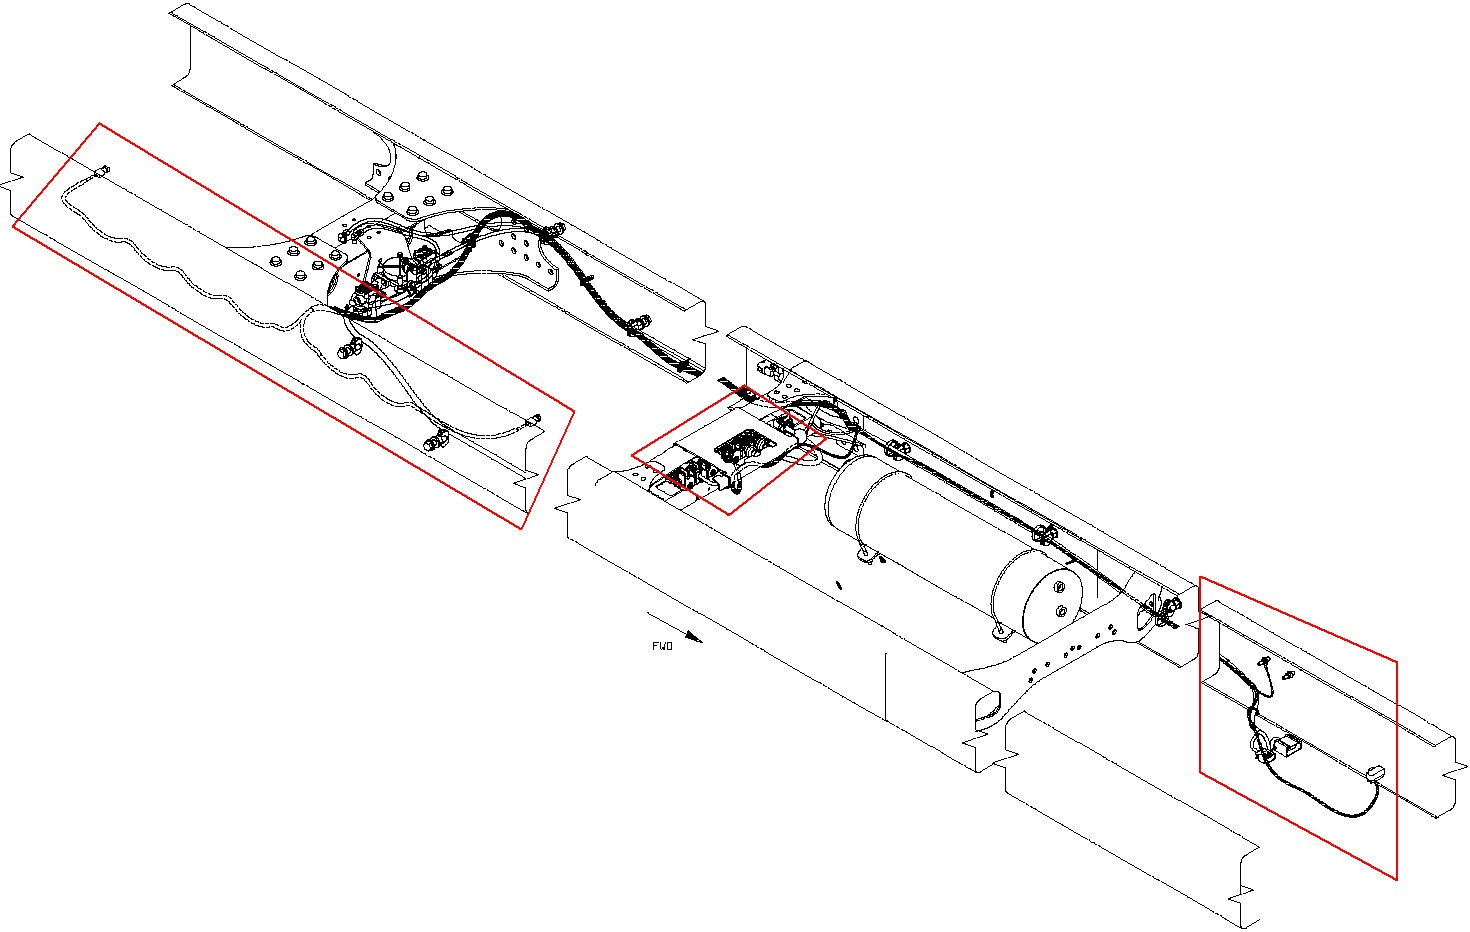 1995 Freightliner Fl70 Fuse Diagram. Diagram. Wiring